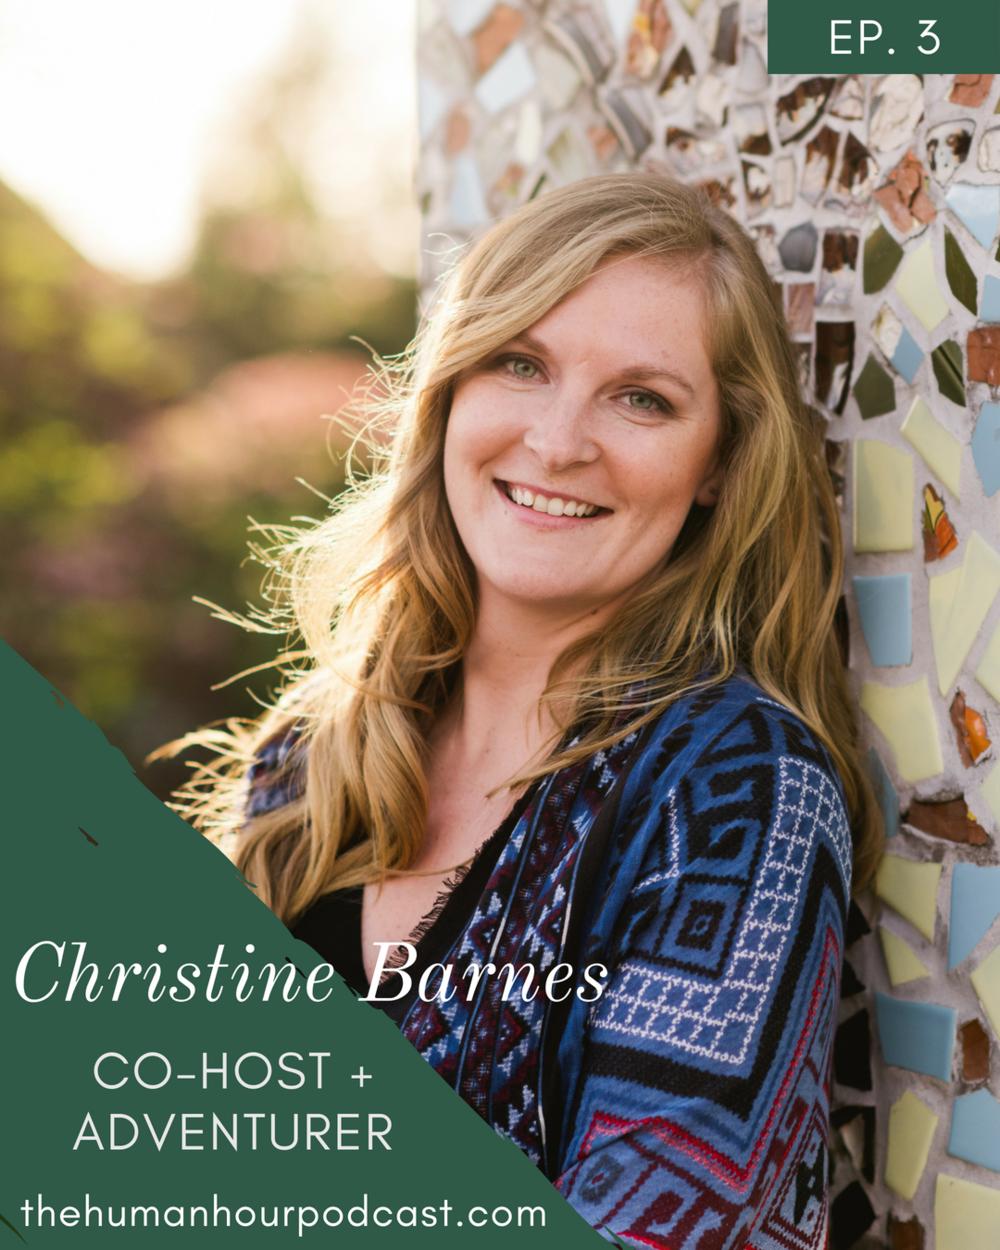 S1 E3: Meet Christine Barnes